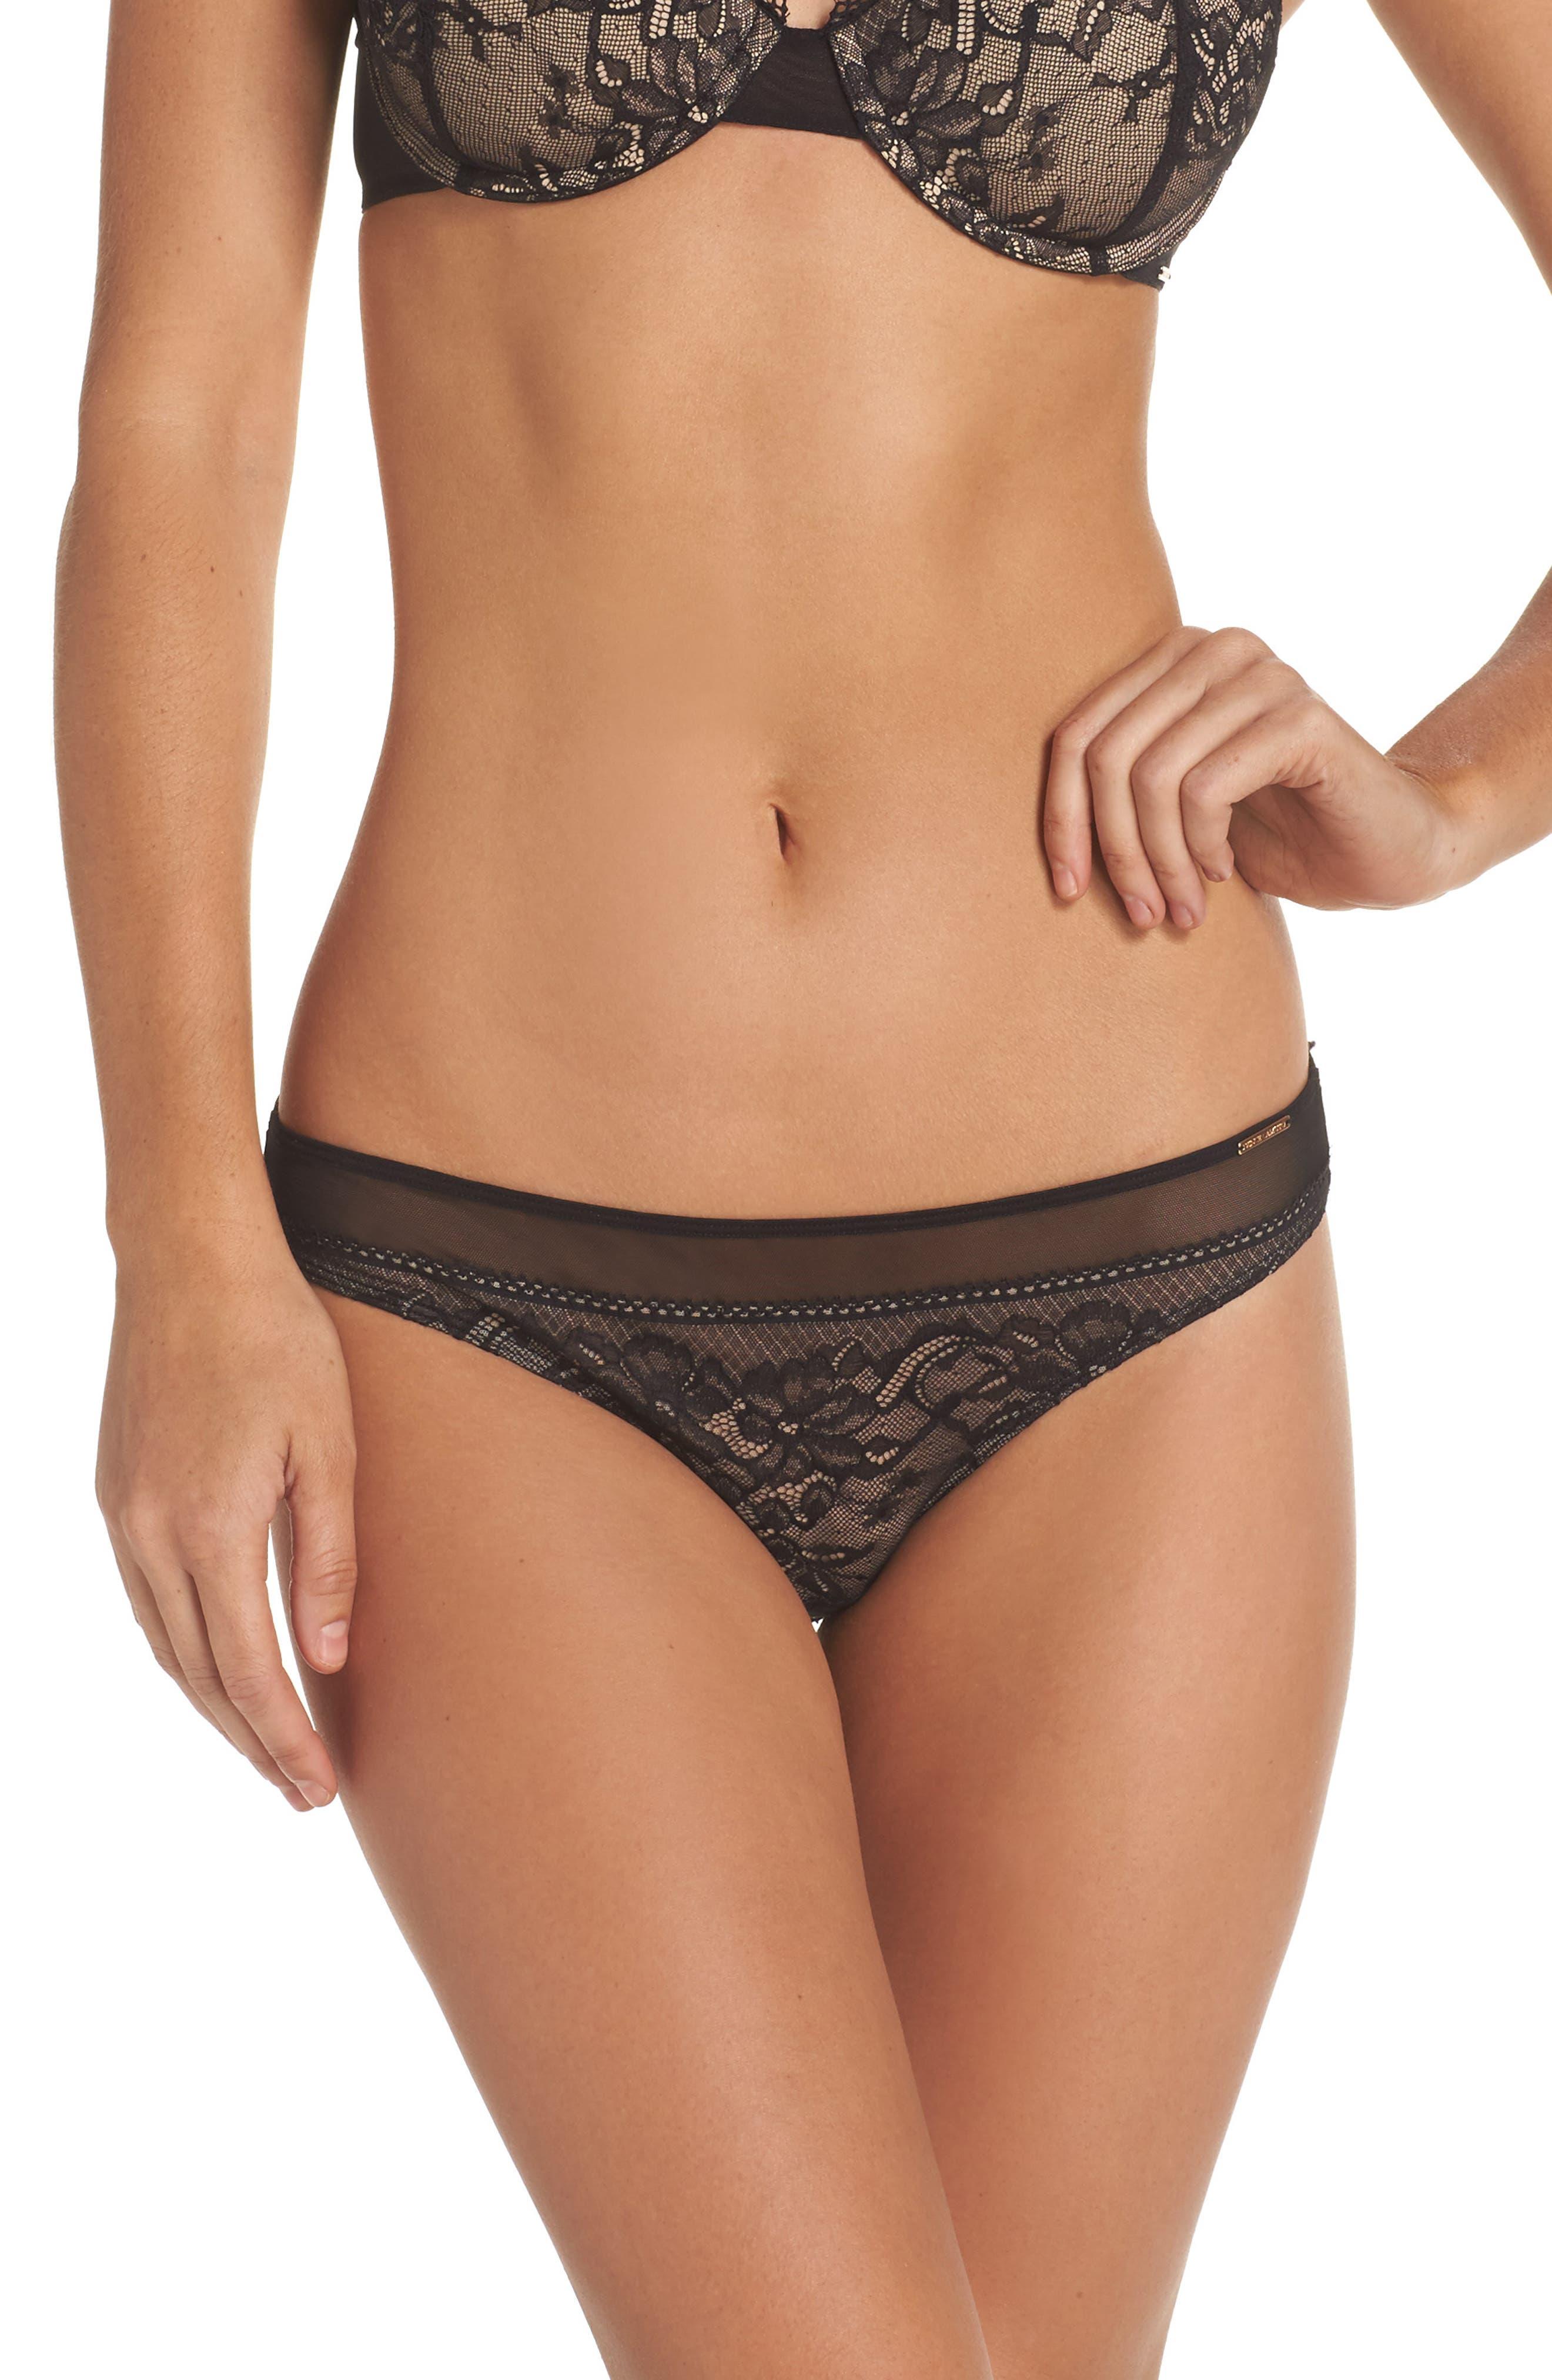 Lorelai Bikini,                             Main thumbnail 1, color,                             001